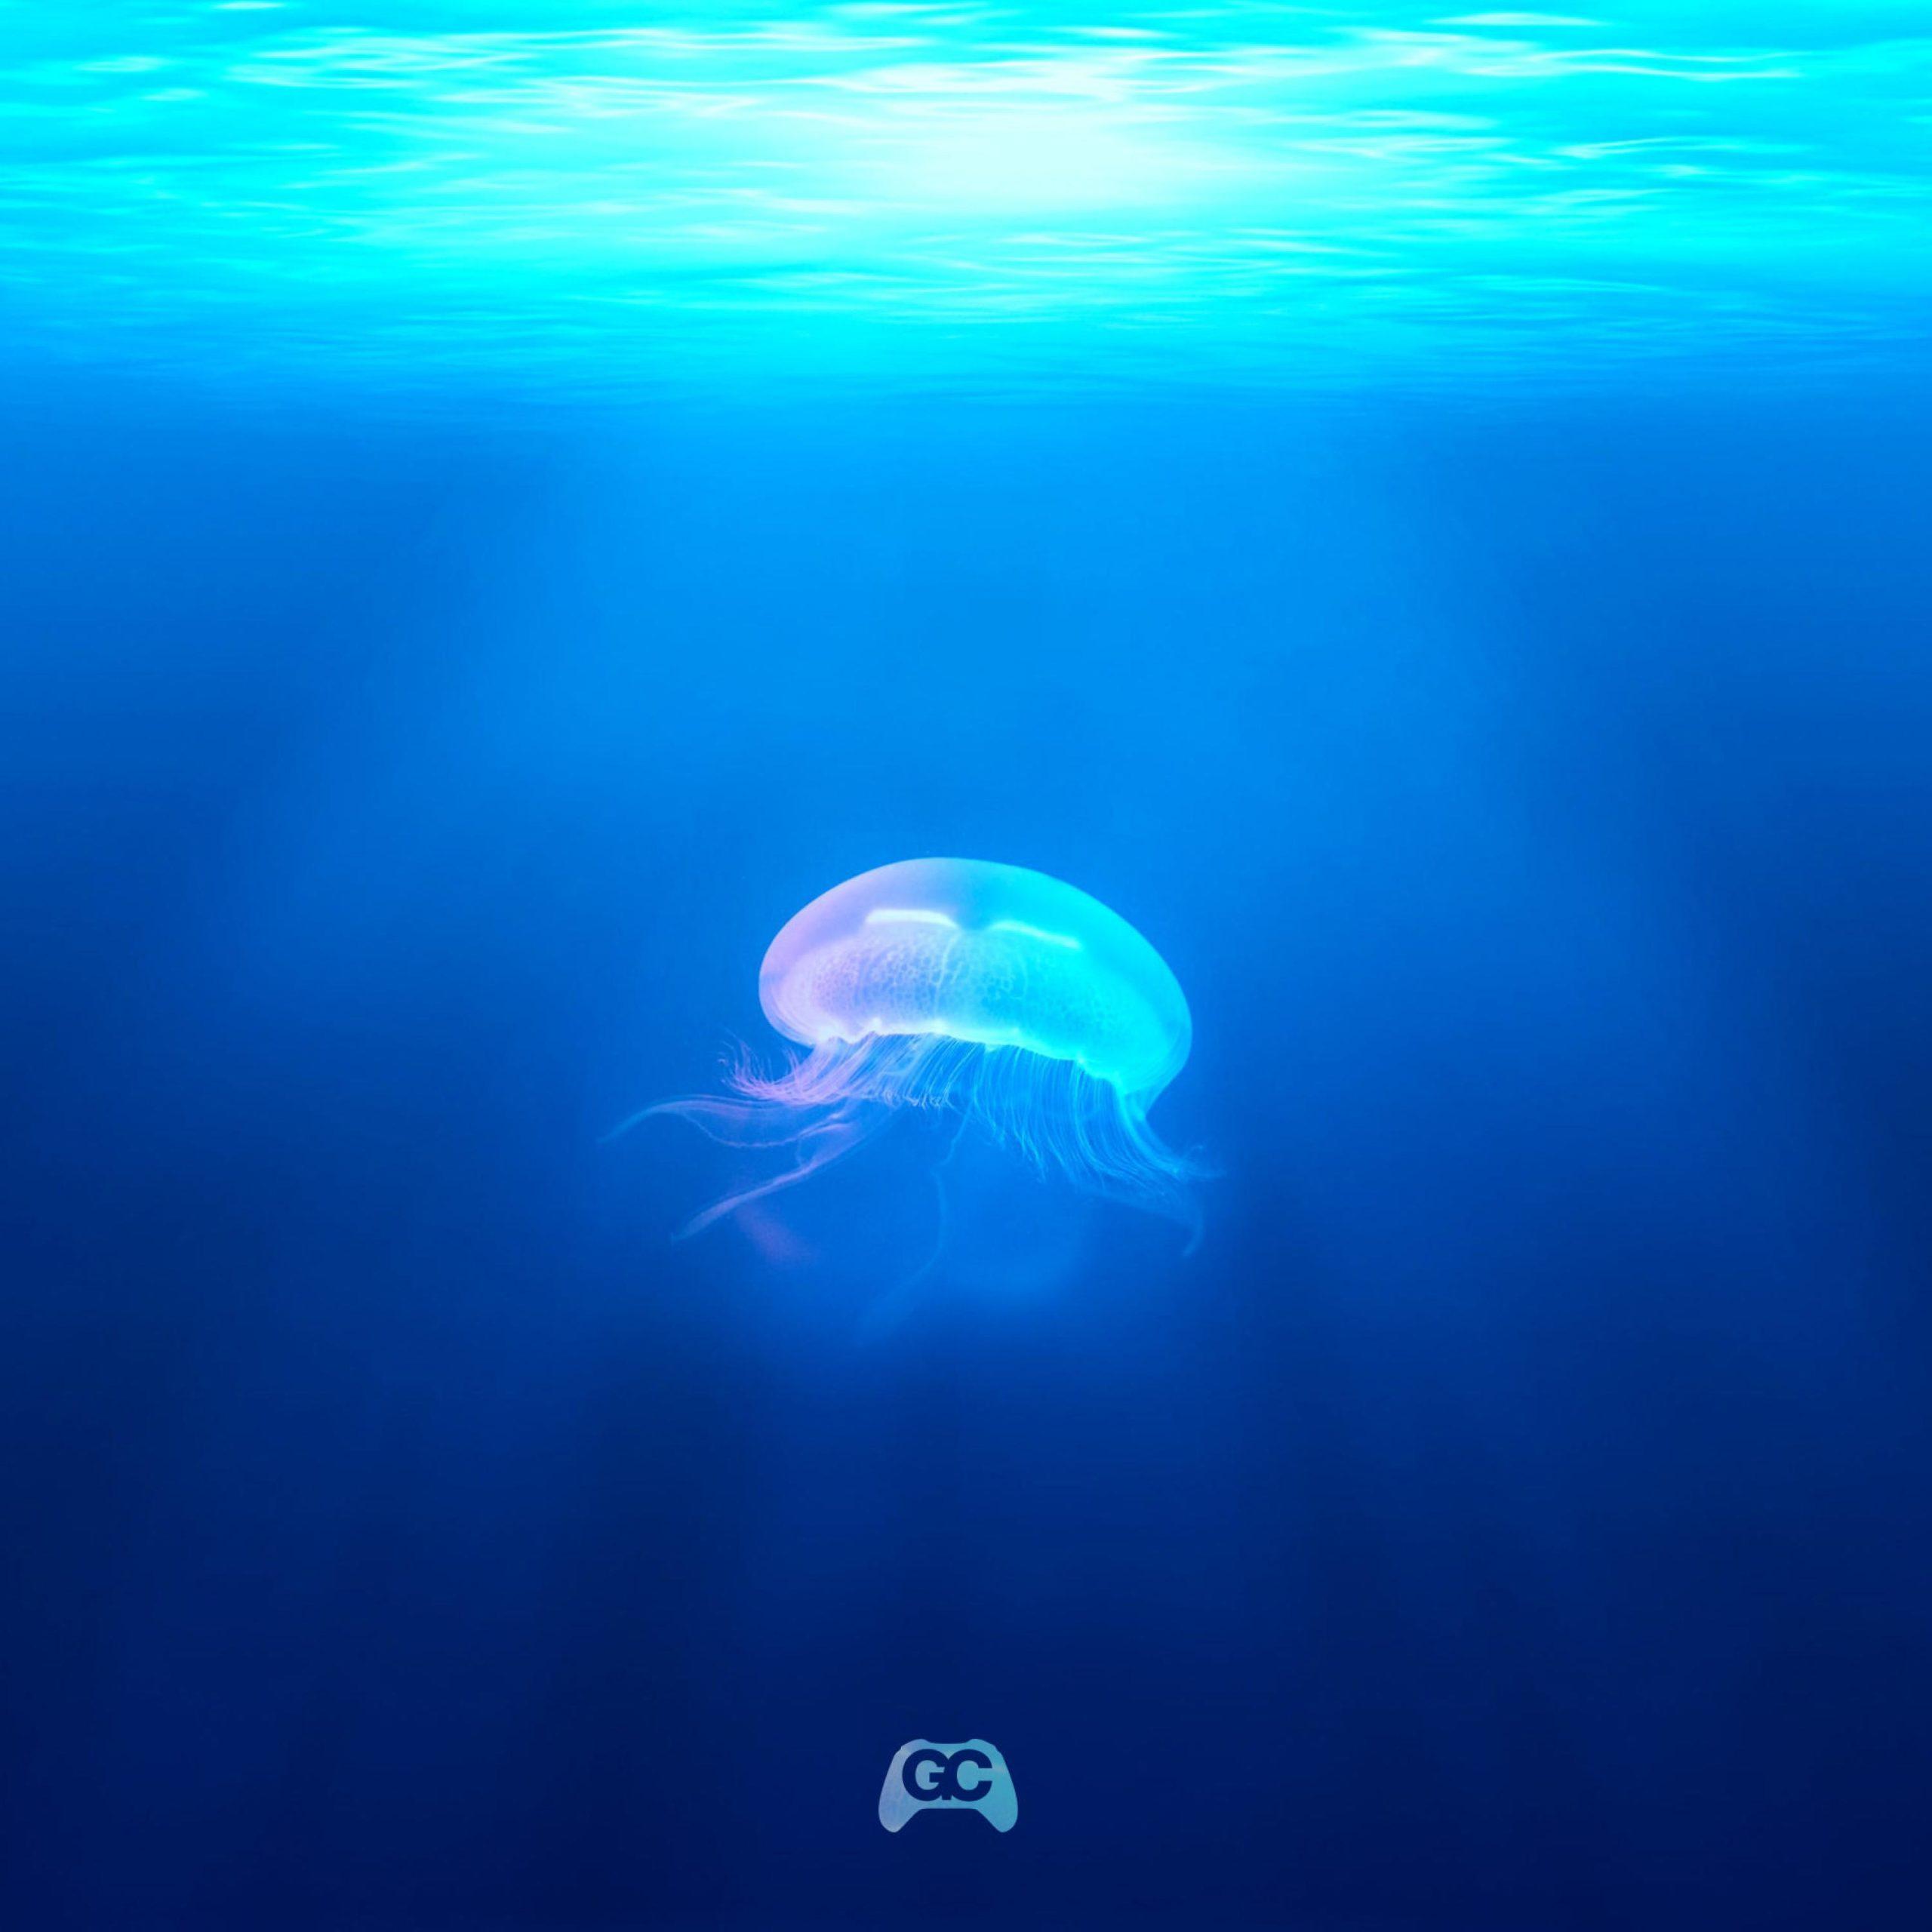 Aquatic Ambiance – Koreskape